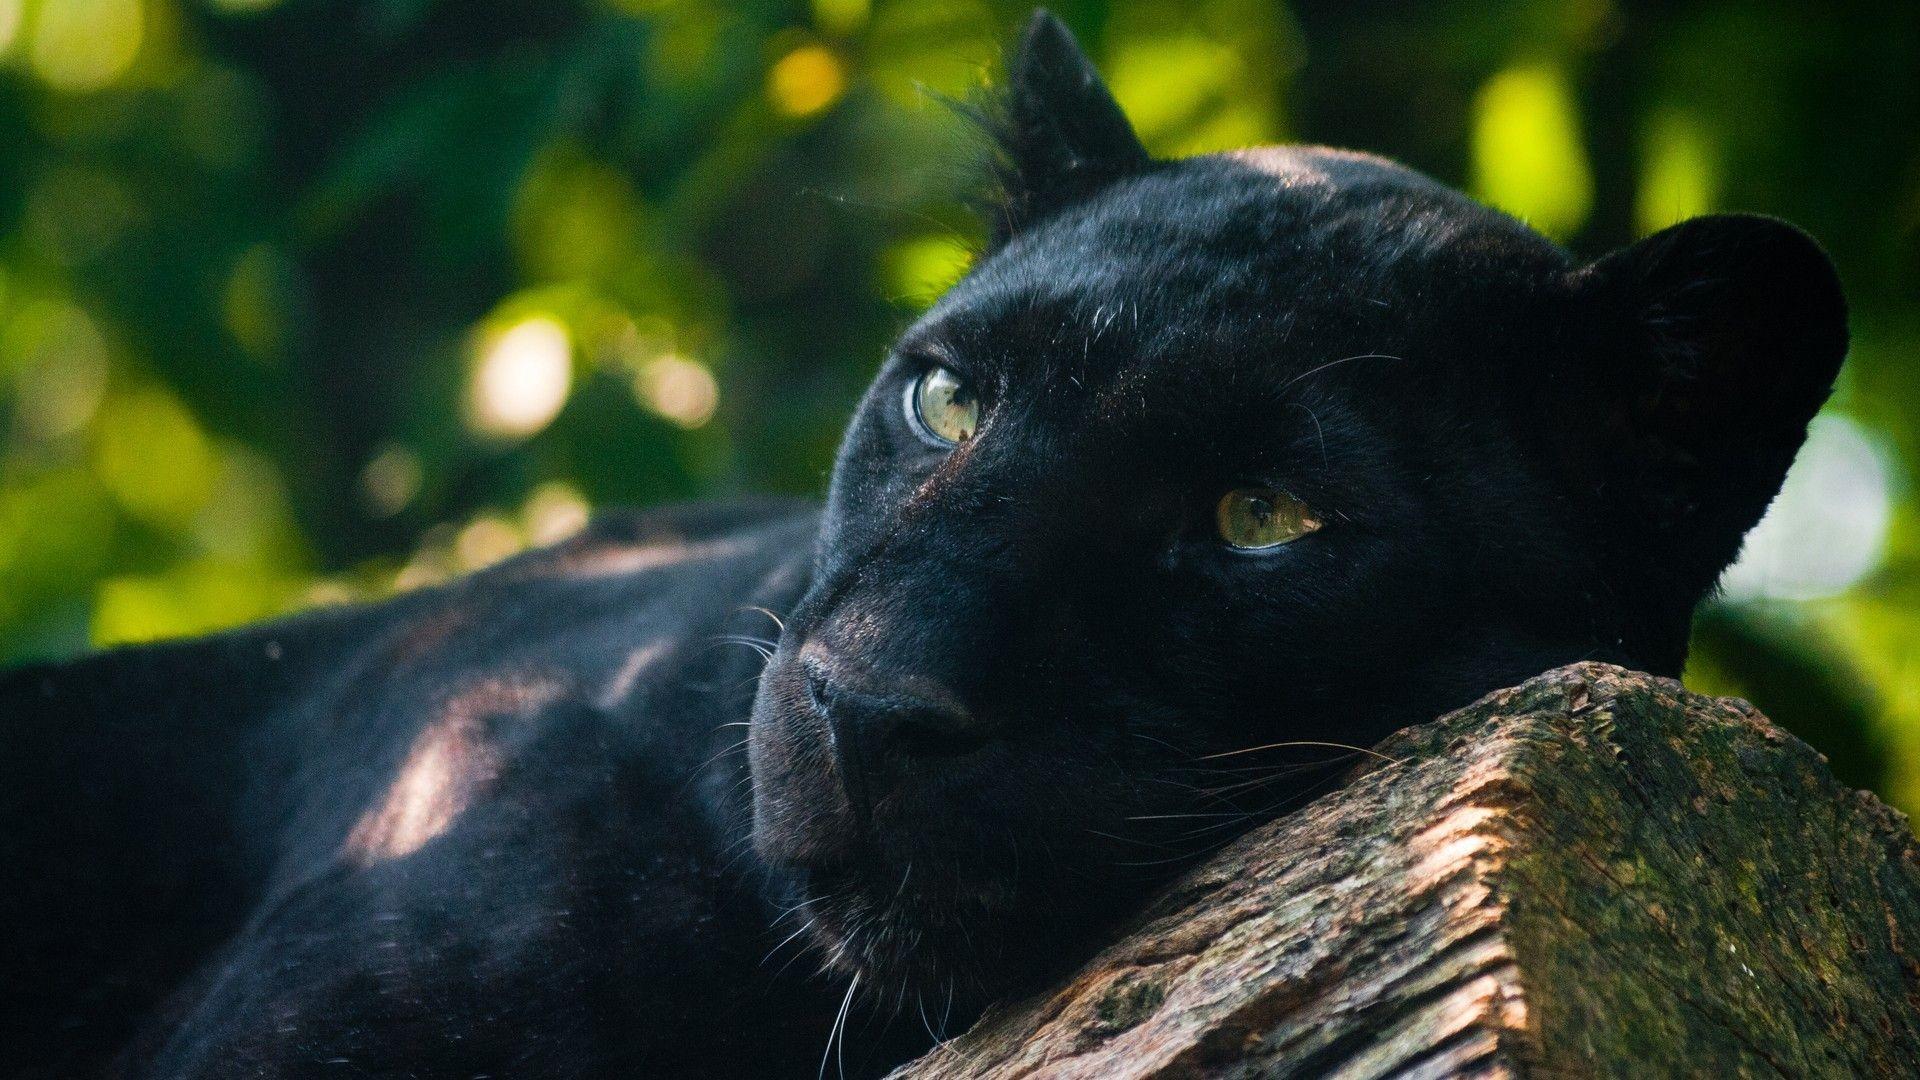 … Wallpaper Nature Animals Panthers. Download